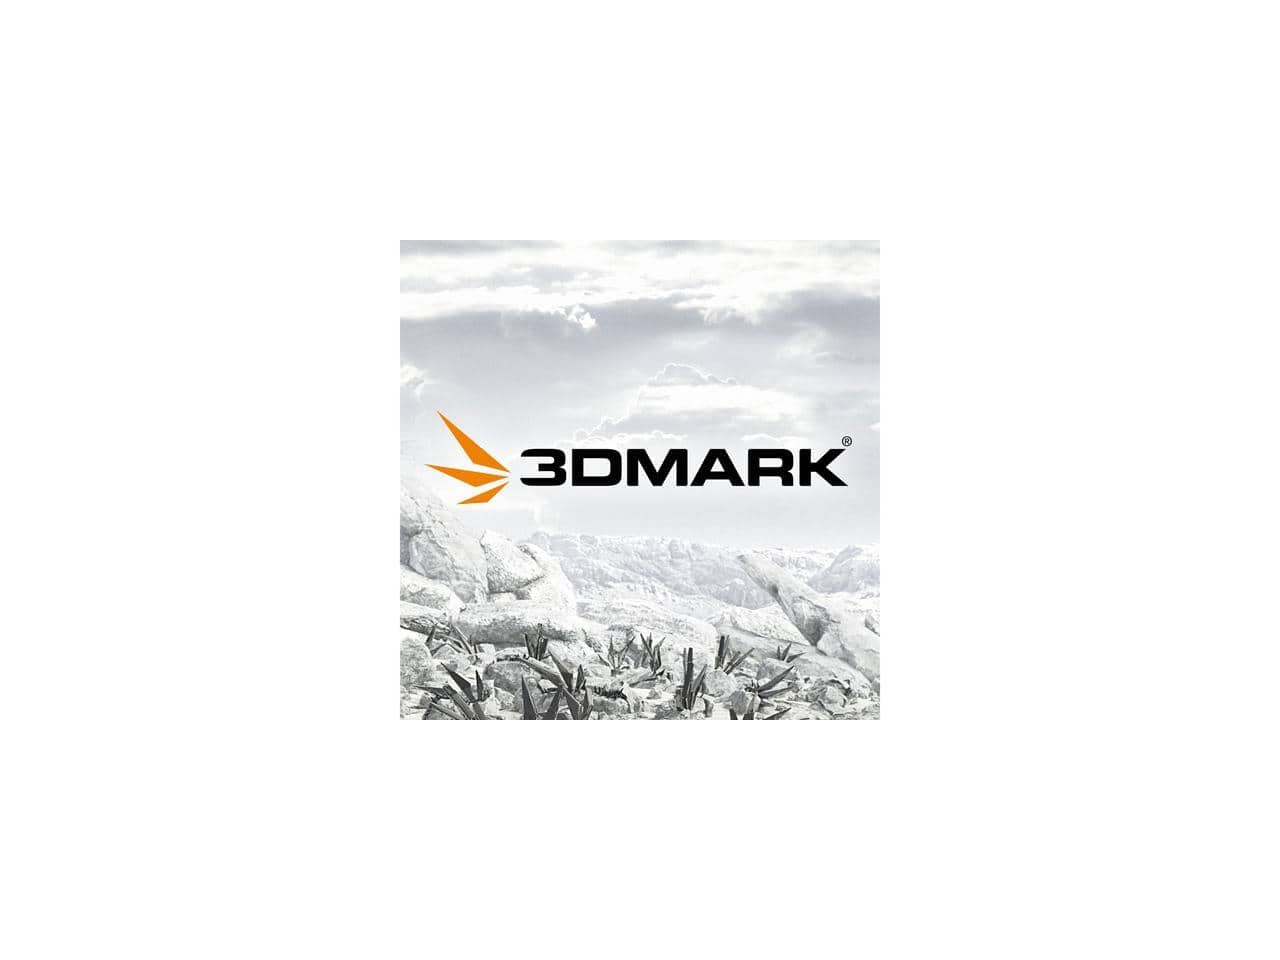 3DMark Advanced Edition $4.49